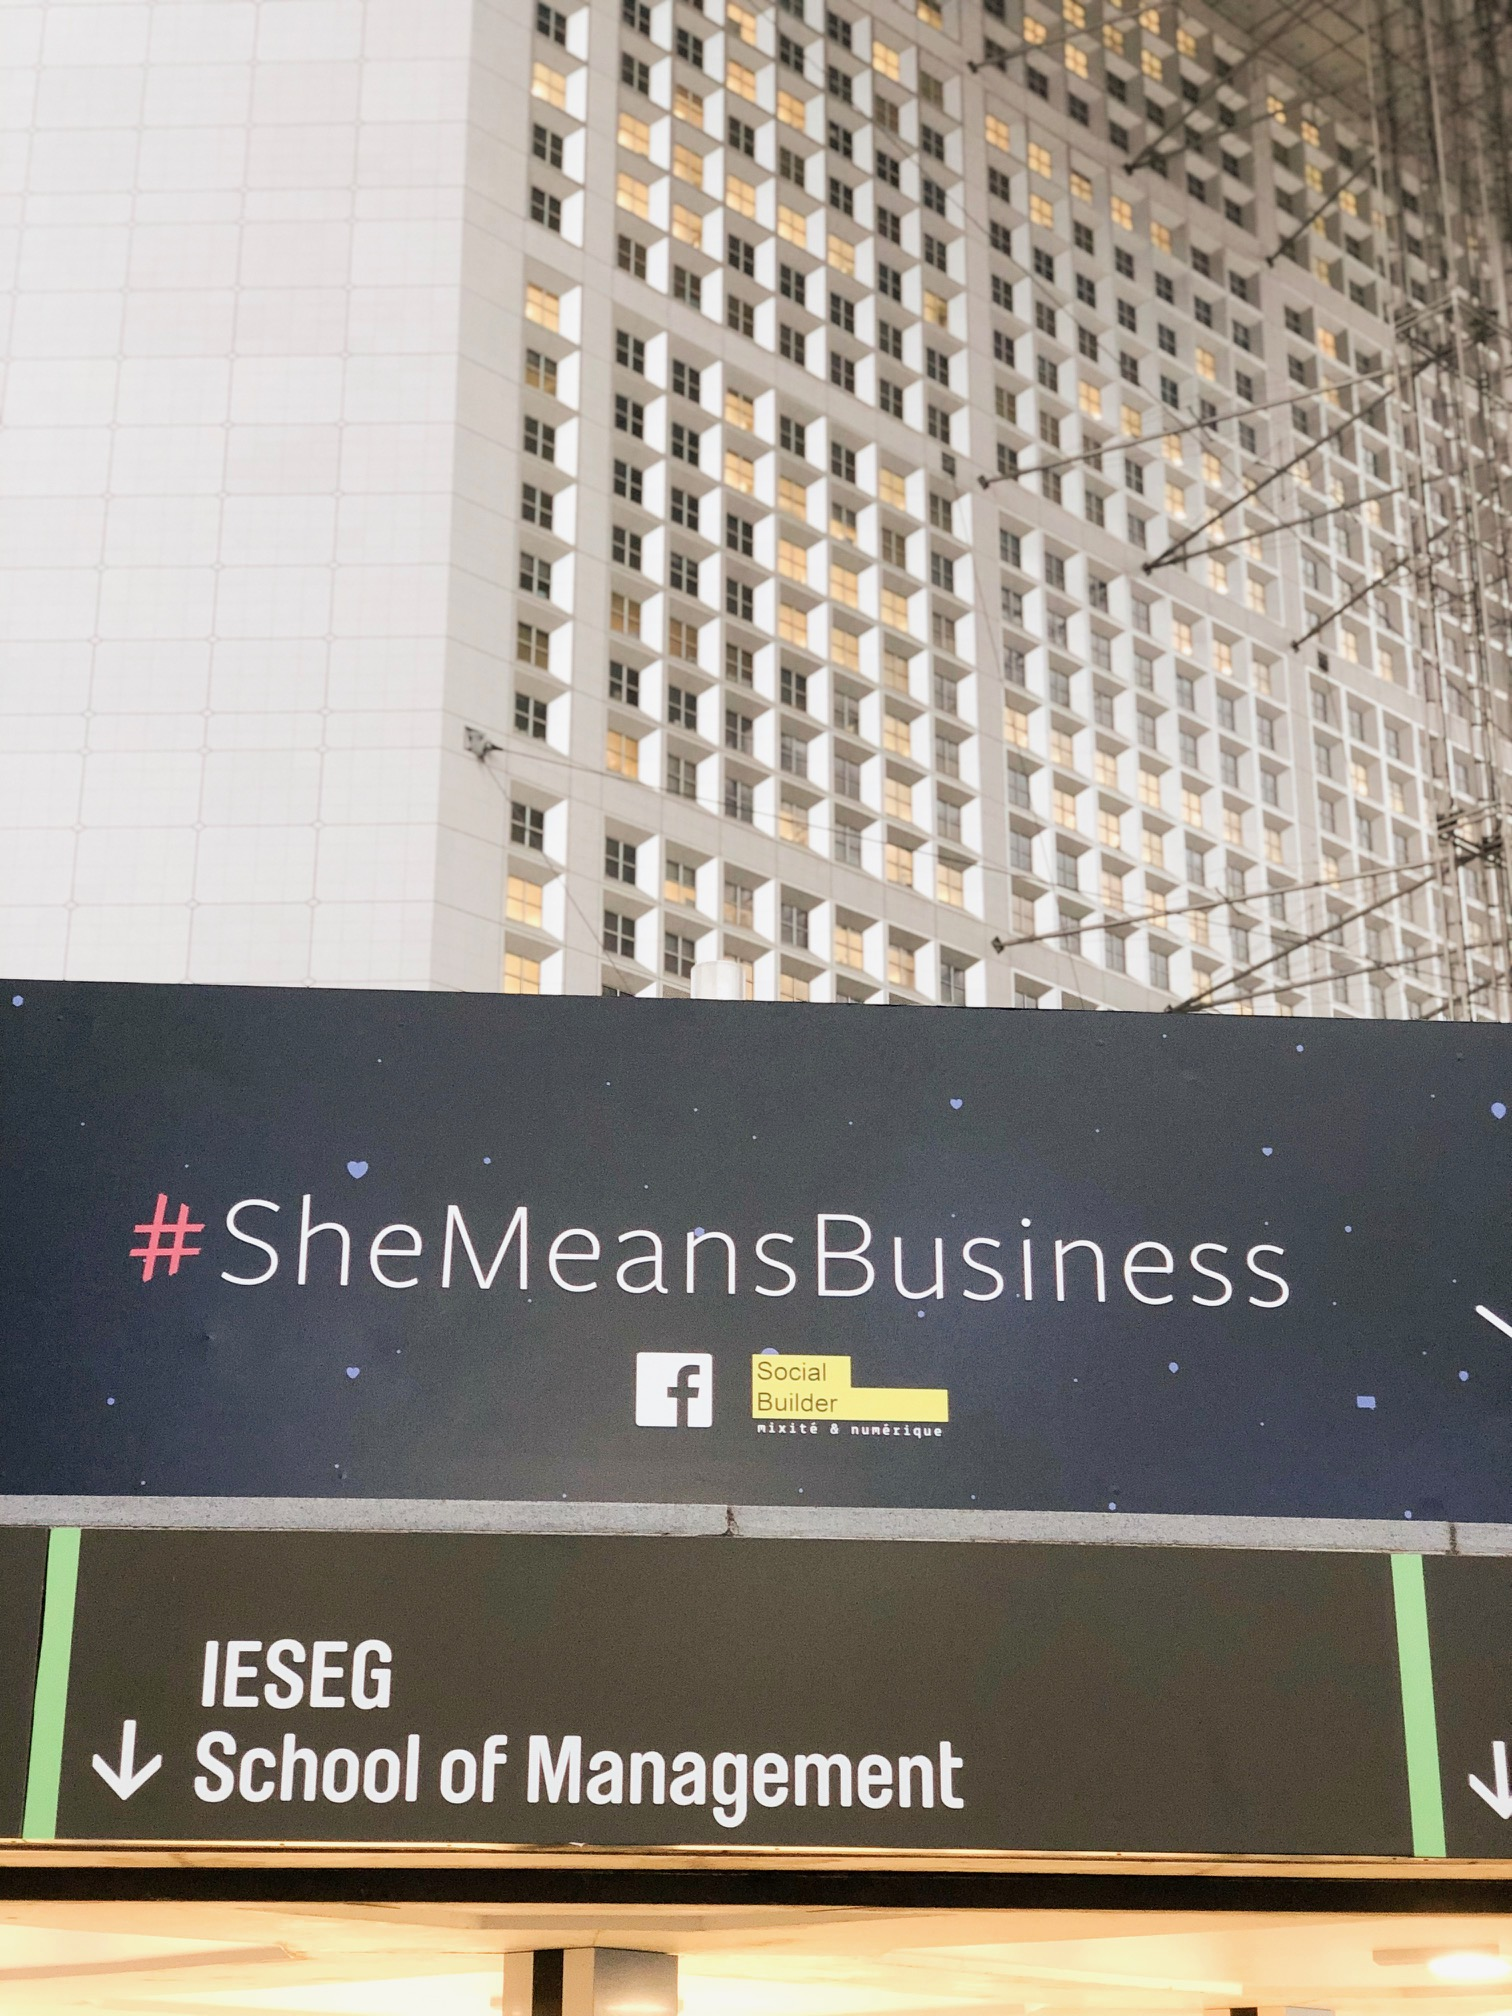 She-Means-Business-elisa-les-bons-tuyaux-4.JPG